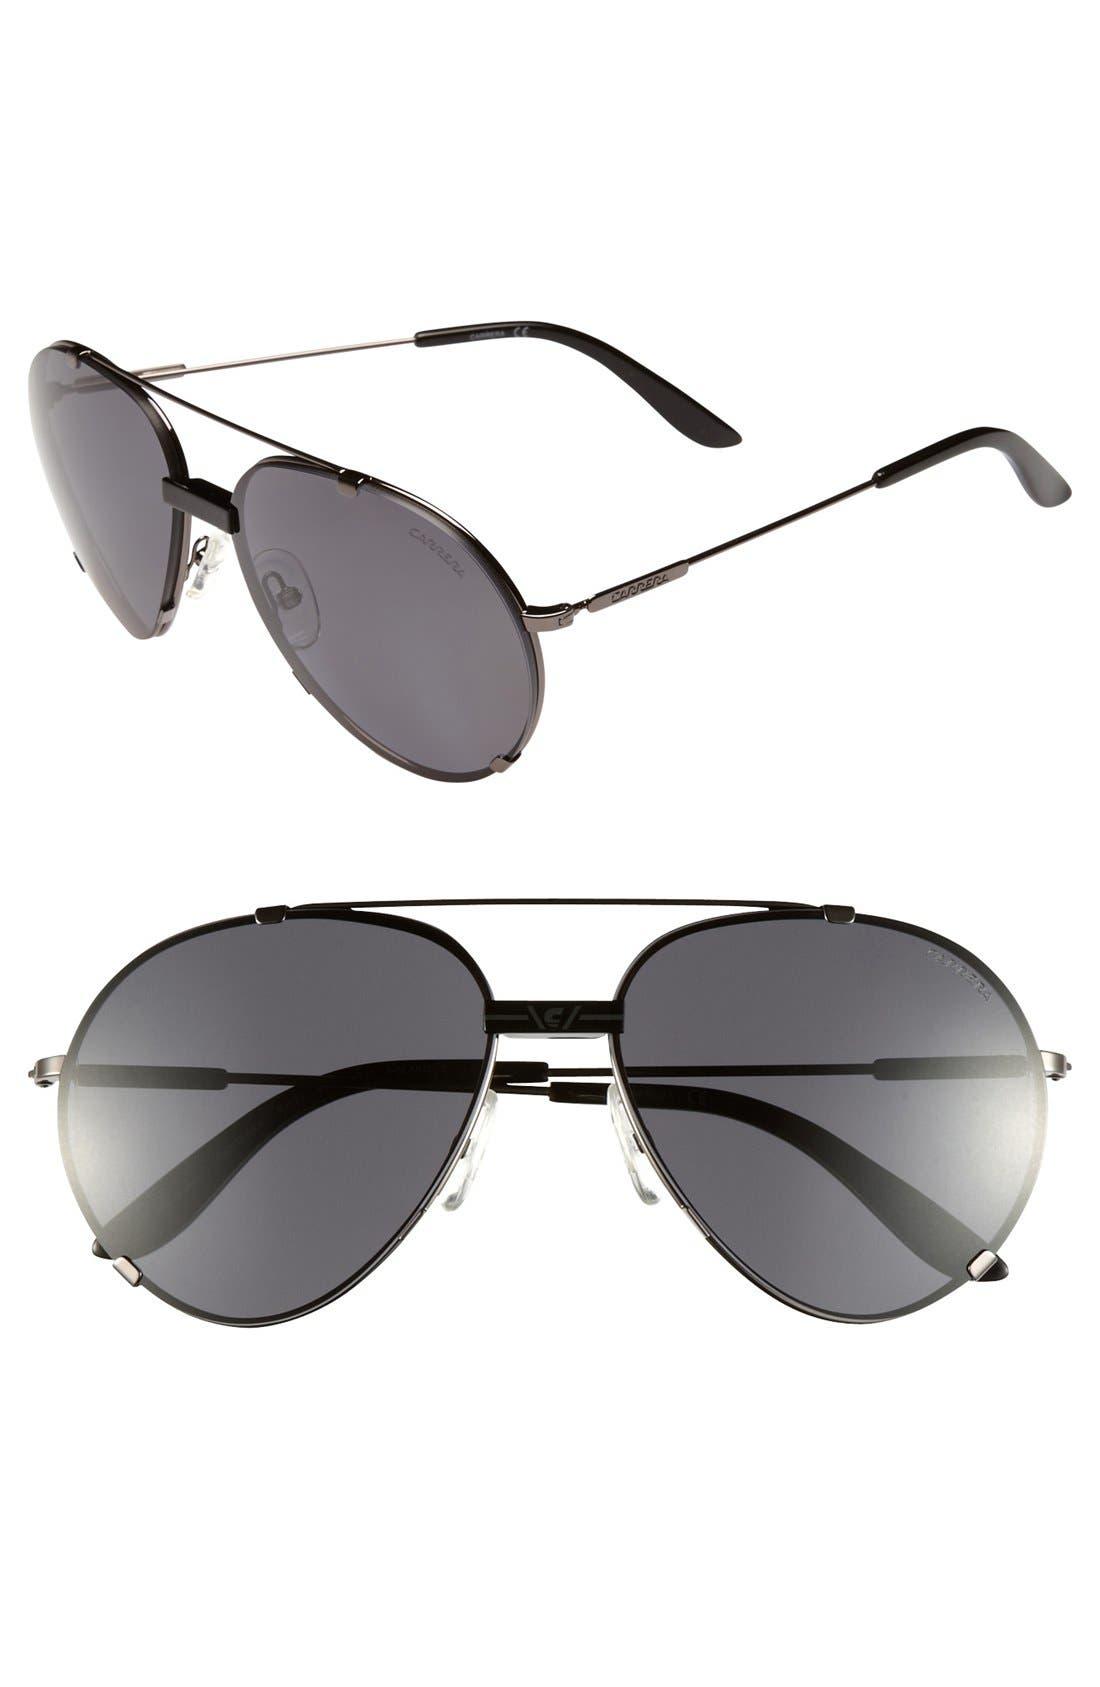 Main Image - Carrera Eyewear 60mm Aviator Sunglasses